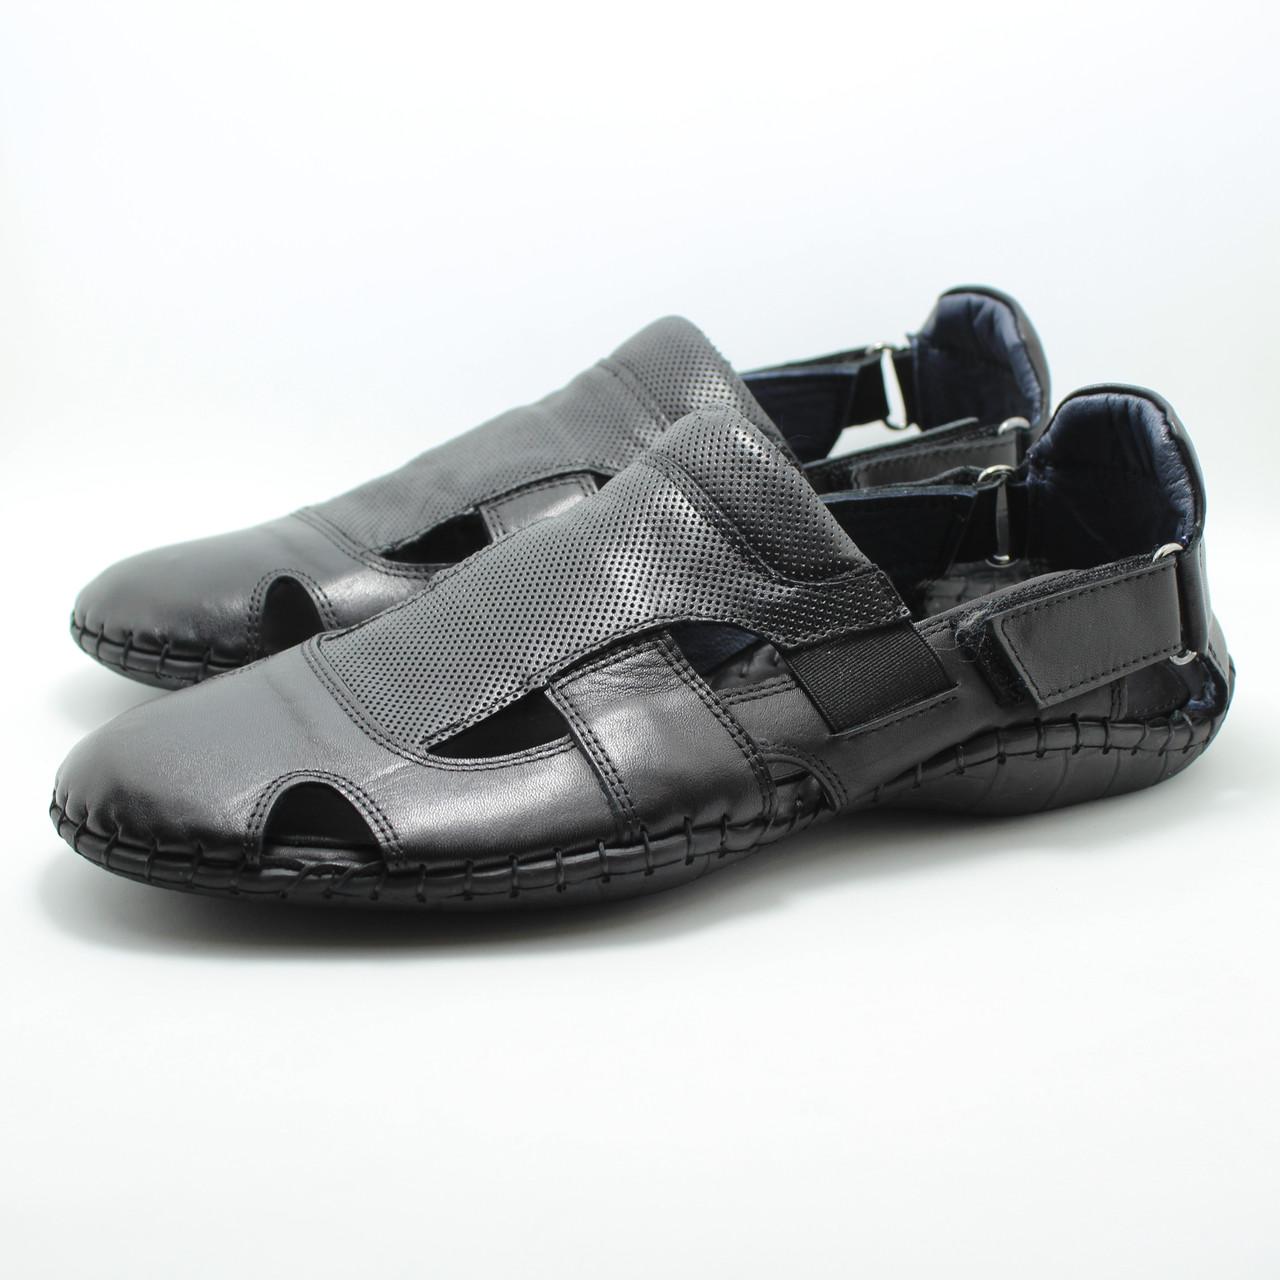 Мужские сандалеты Luciano Bellini T103 79543